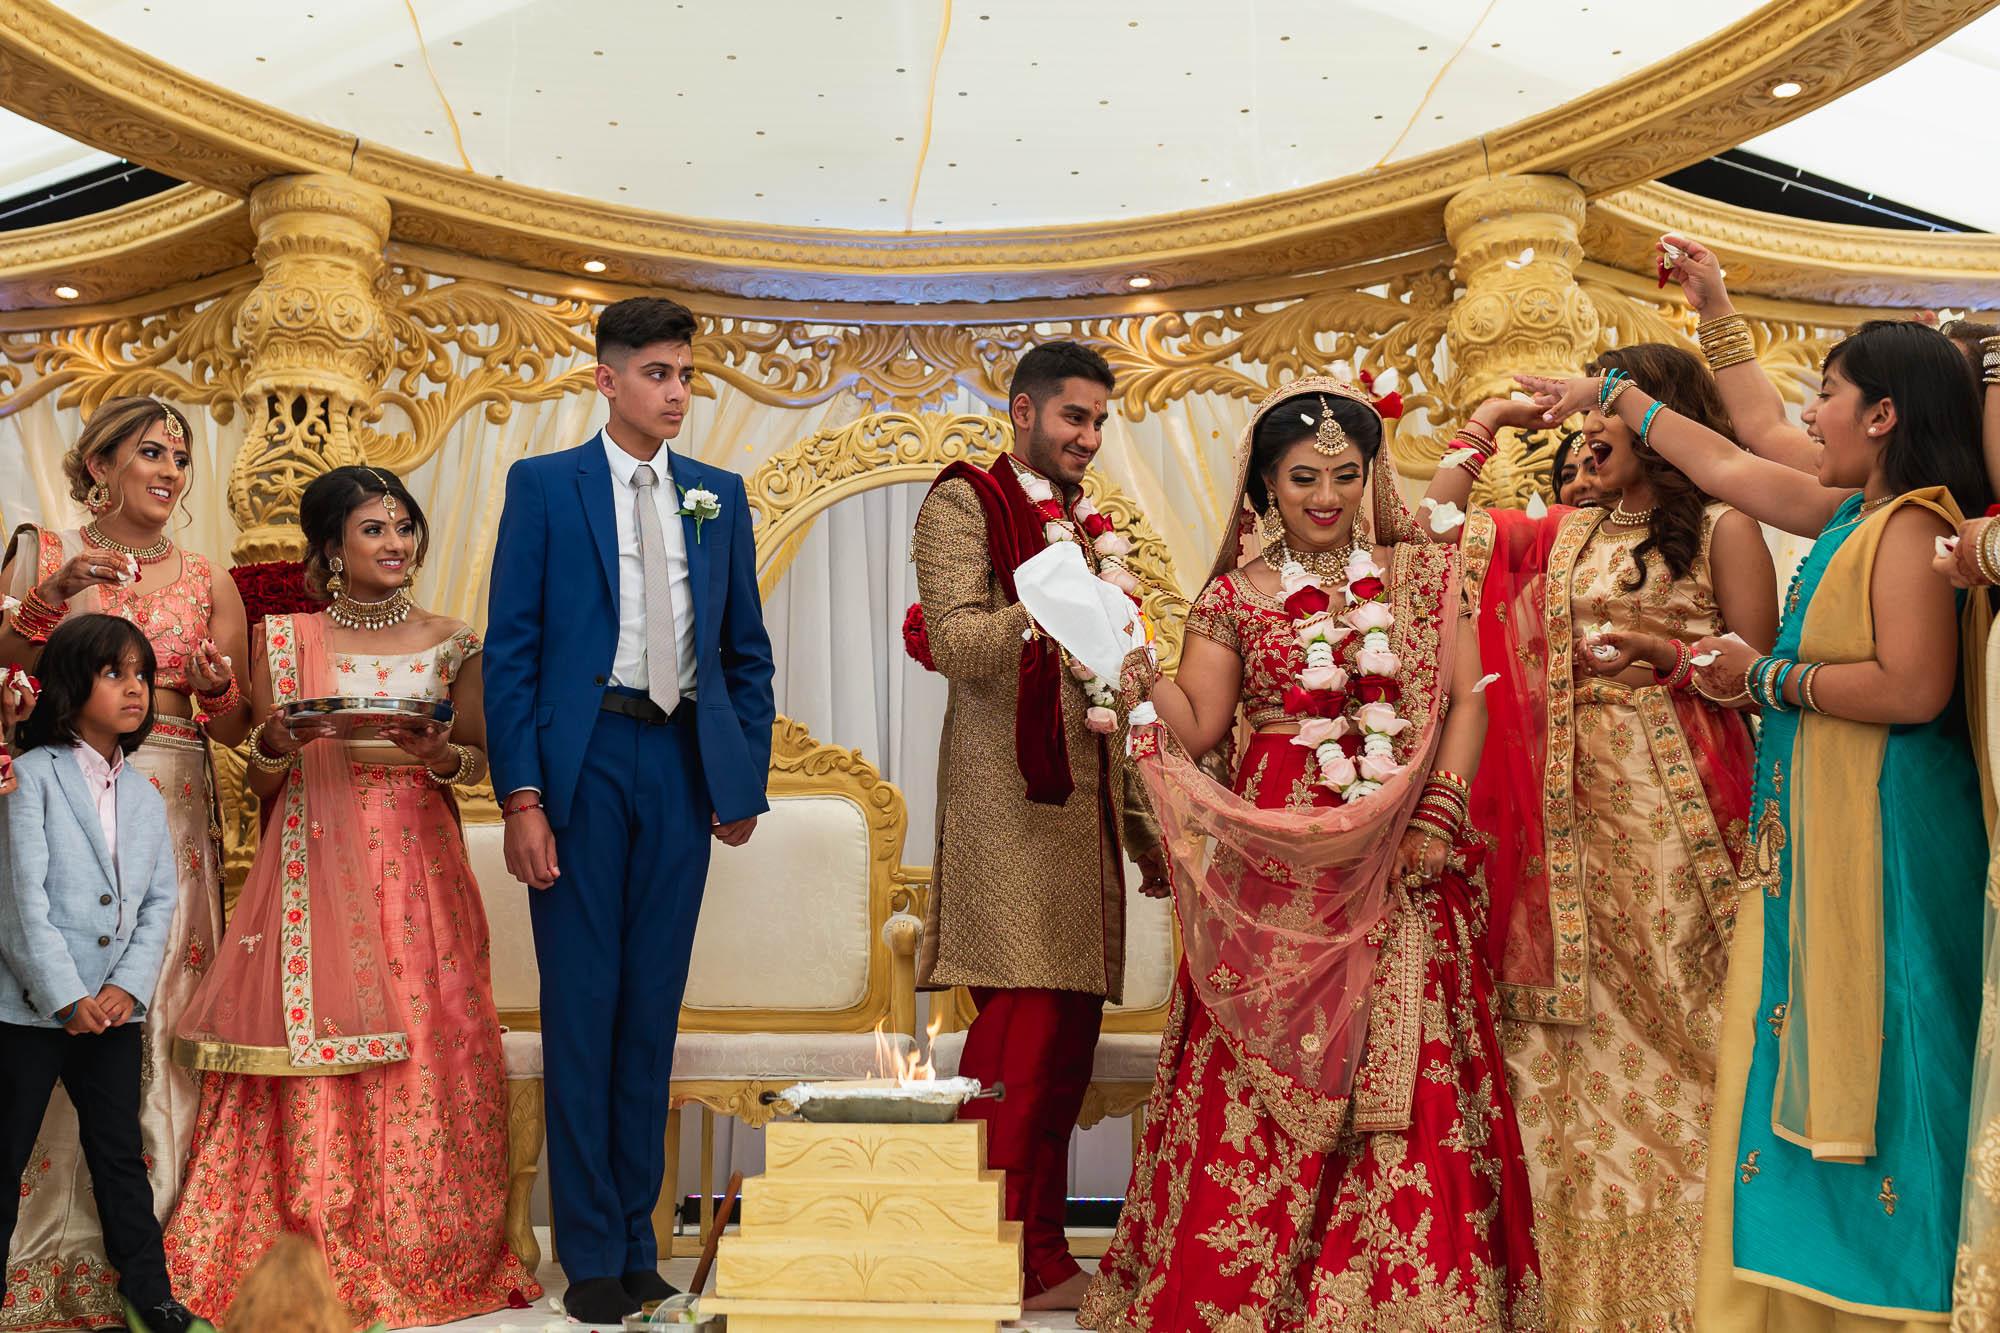 Dunchurch Park Hotel, Asian wedding photographer Midlands, Pheras